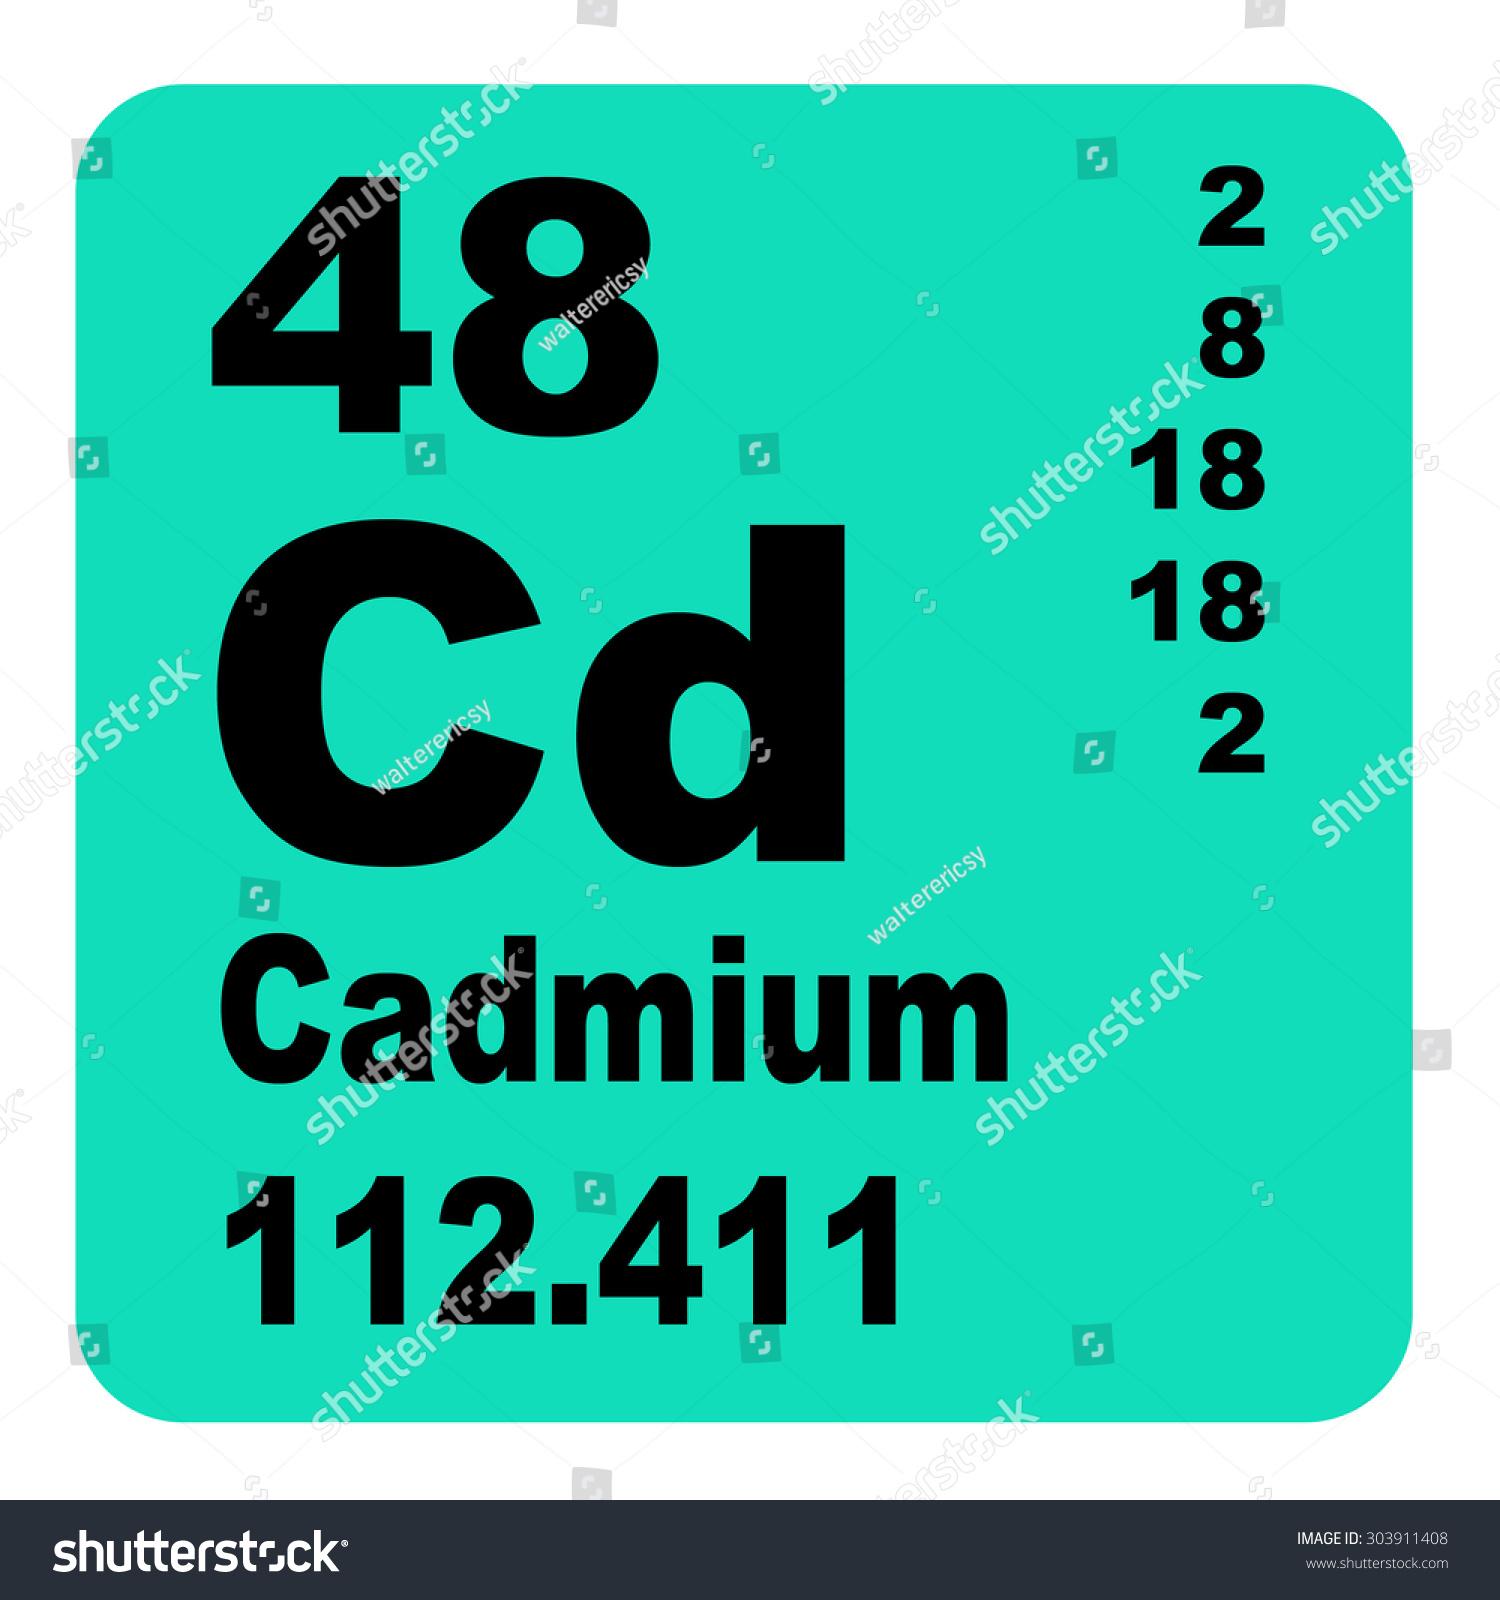 112 element periodic table choice image periodic table images periodic table 112 choice image volvo truck wiring diagrams free cadmium on periodic table image collections gamestrikefo Image collections